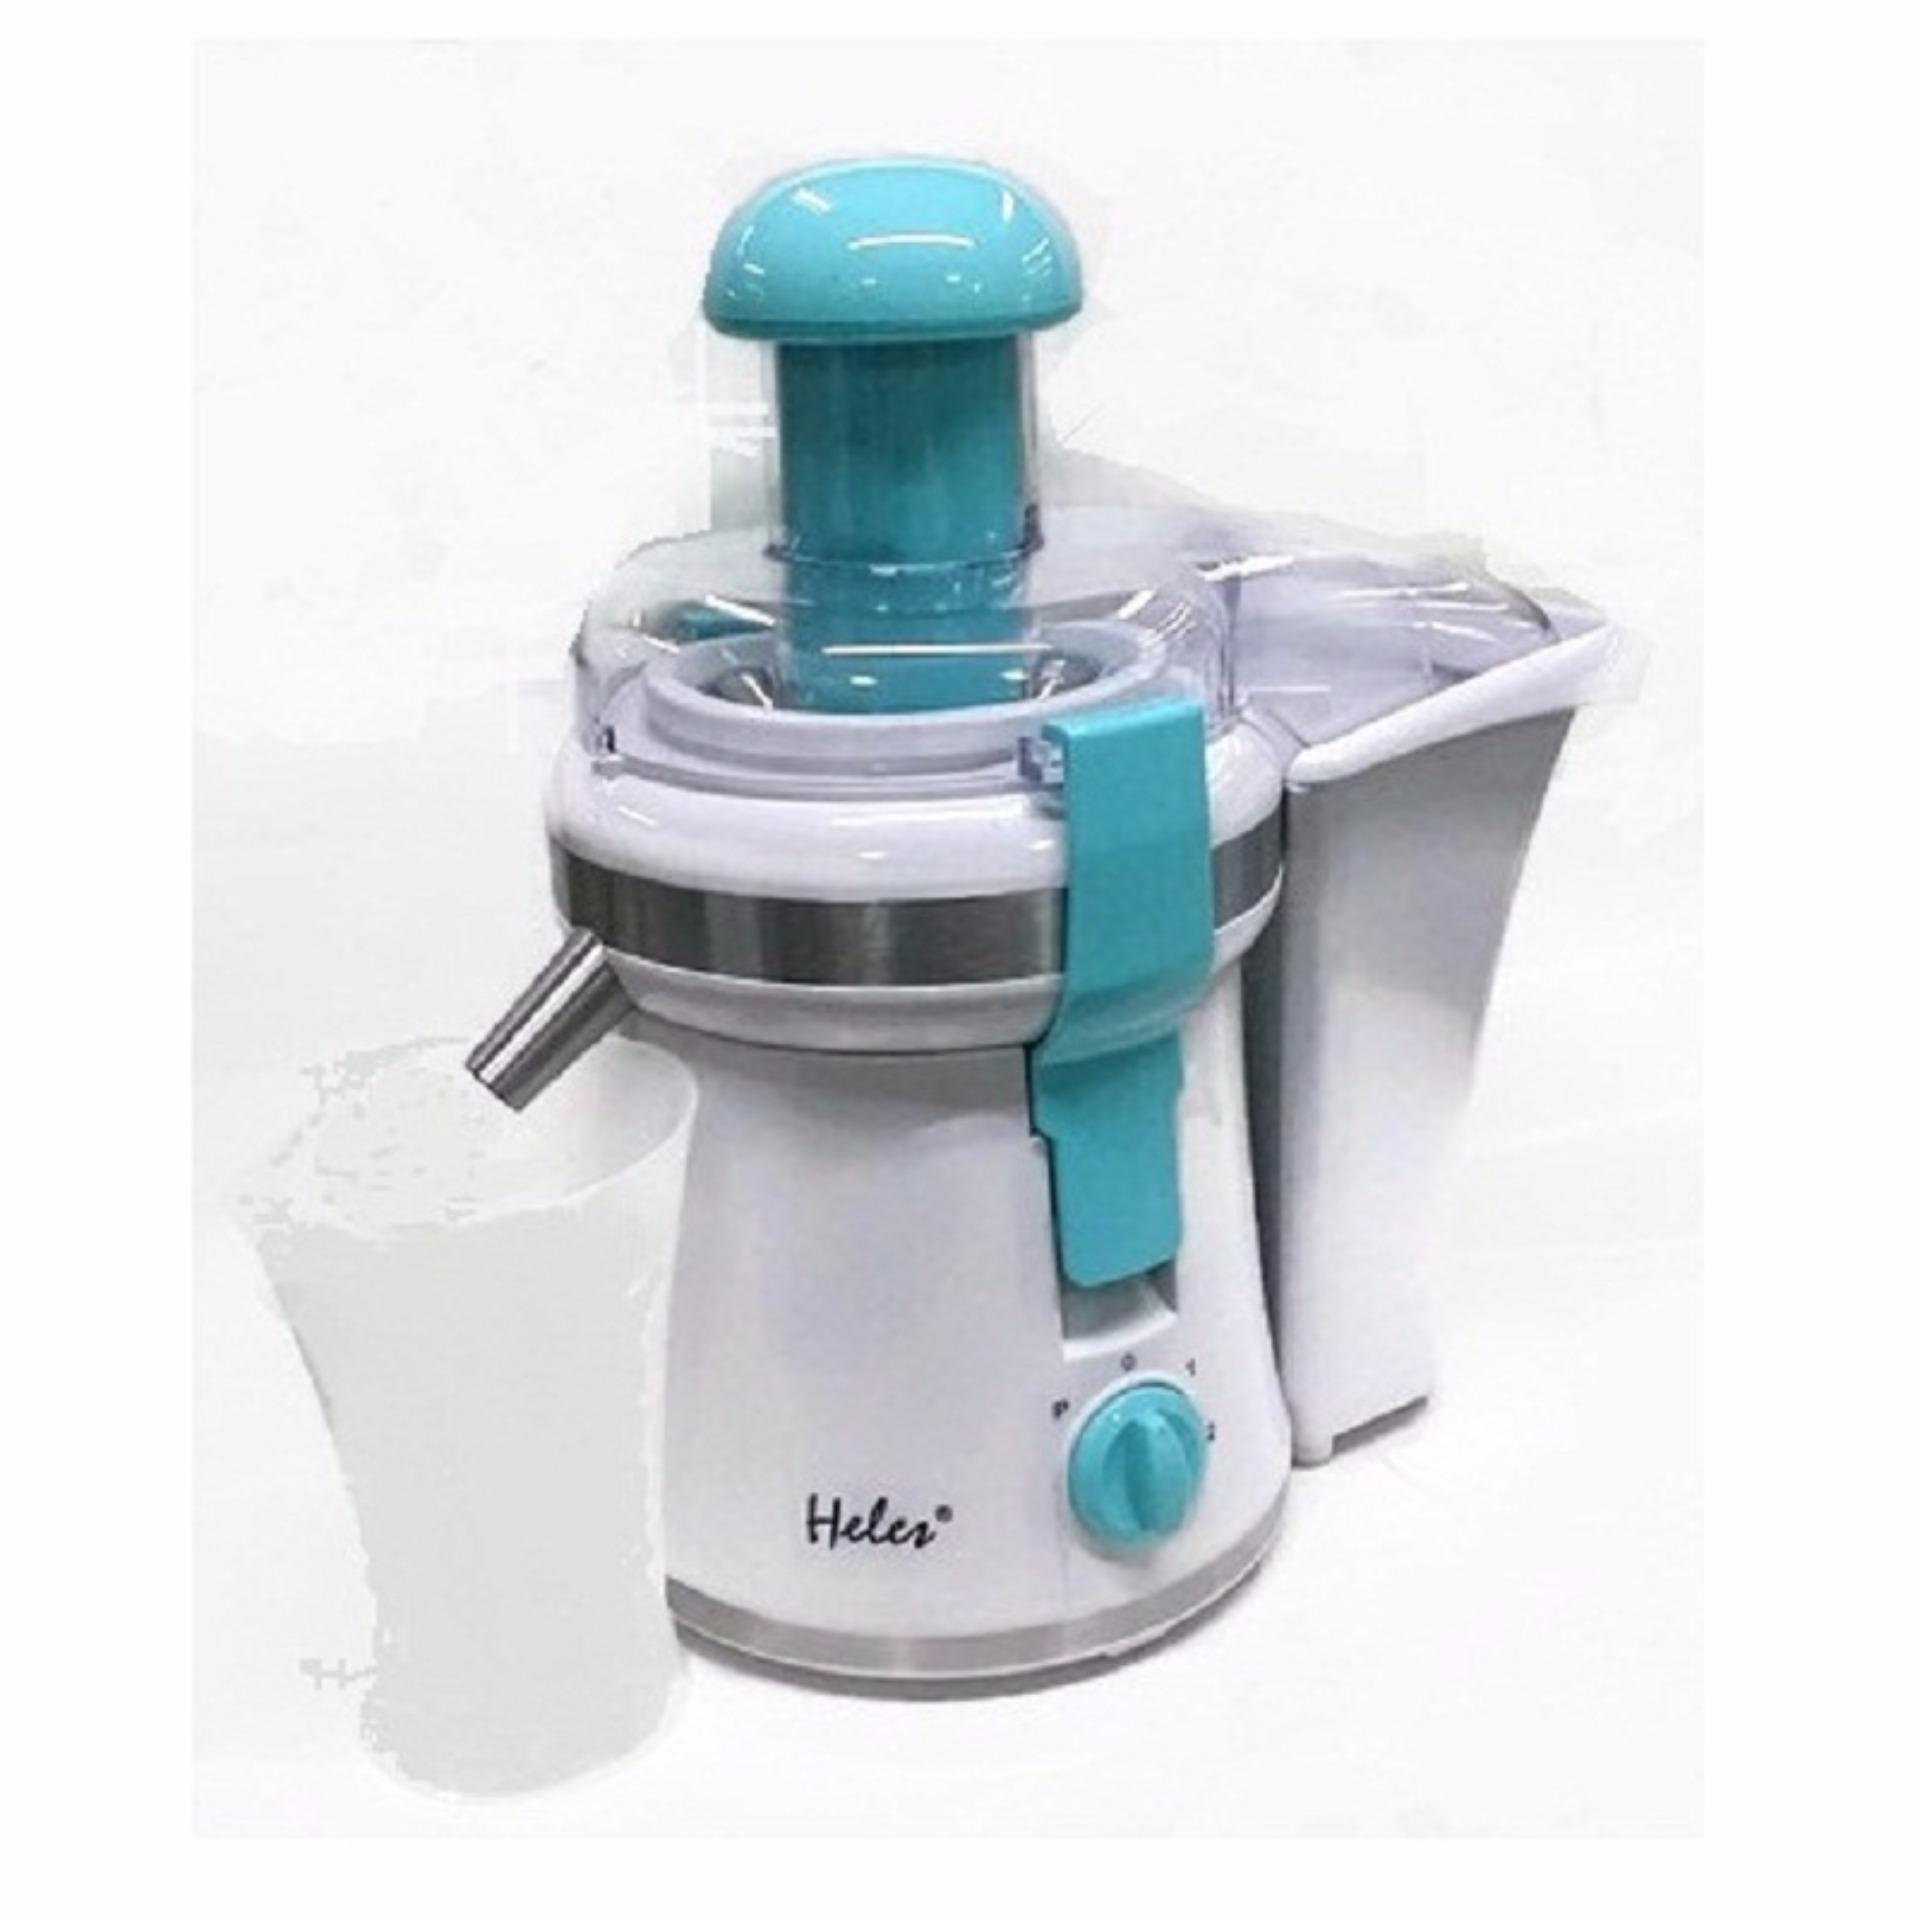 Heles Juice Extractor HL-253 / Juicer Electric 1 liter .